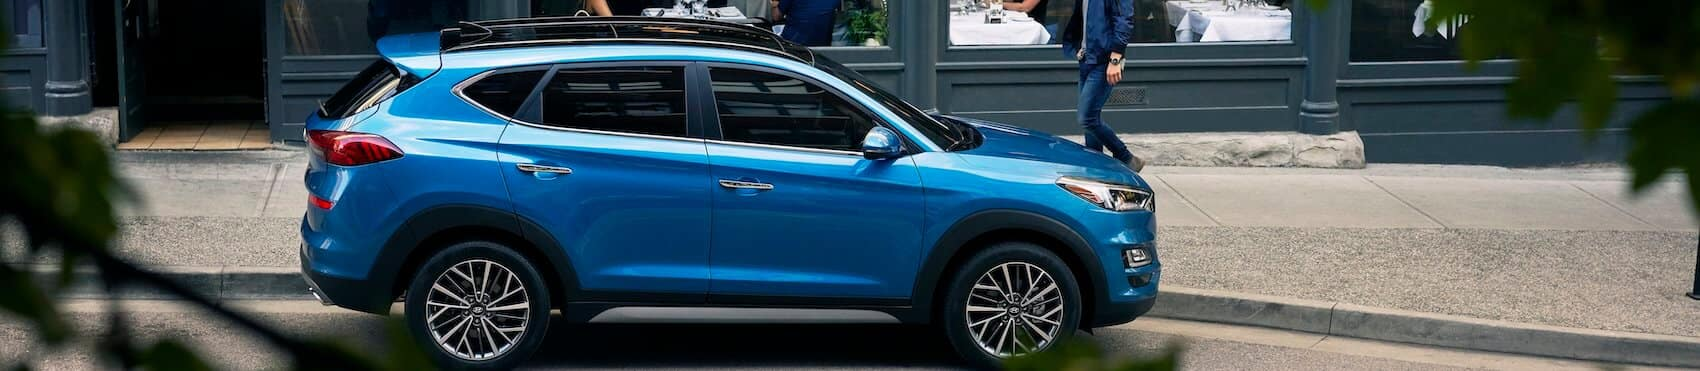 Hyundai Tucson Trim Levels